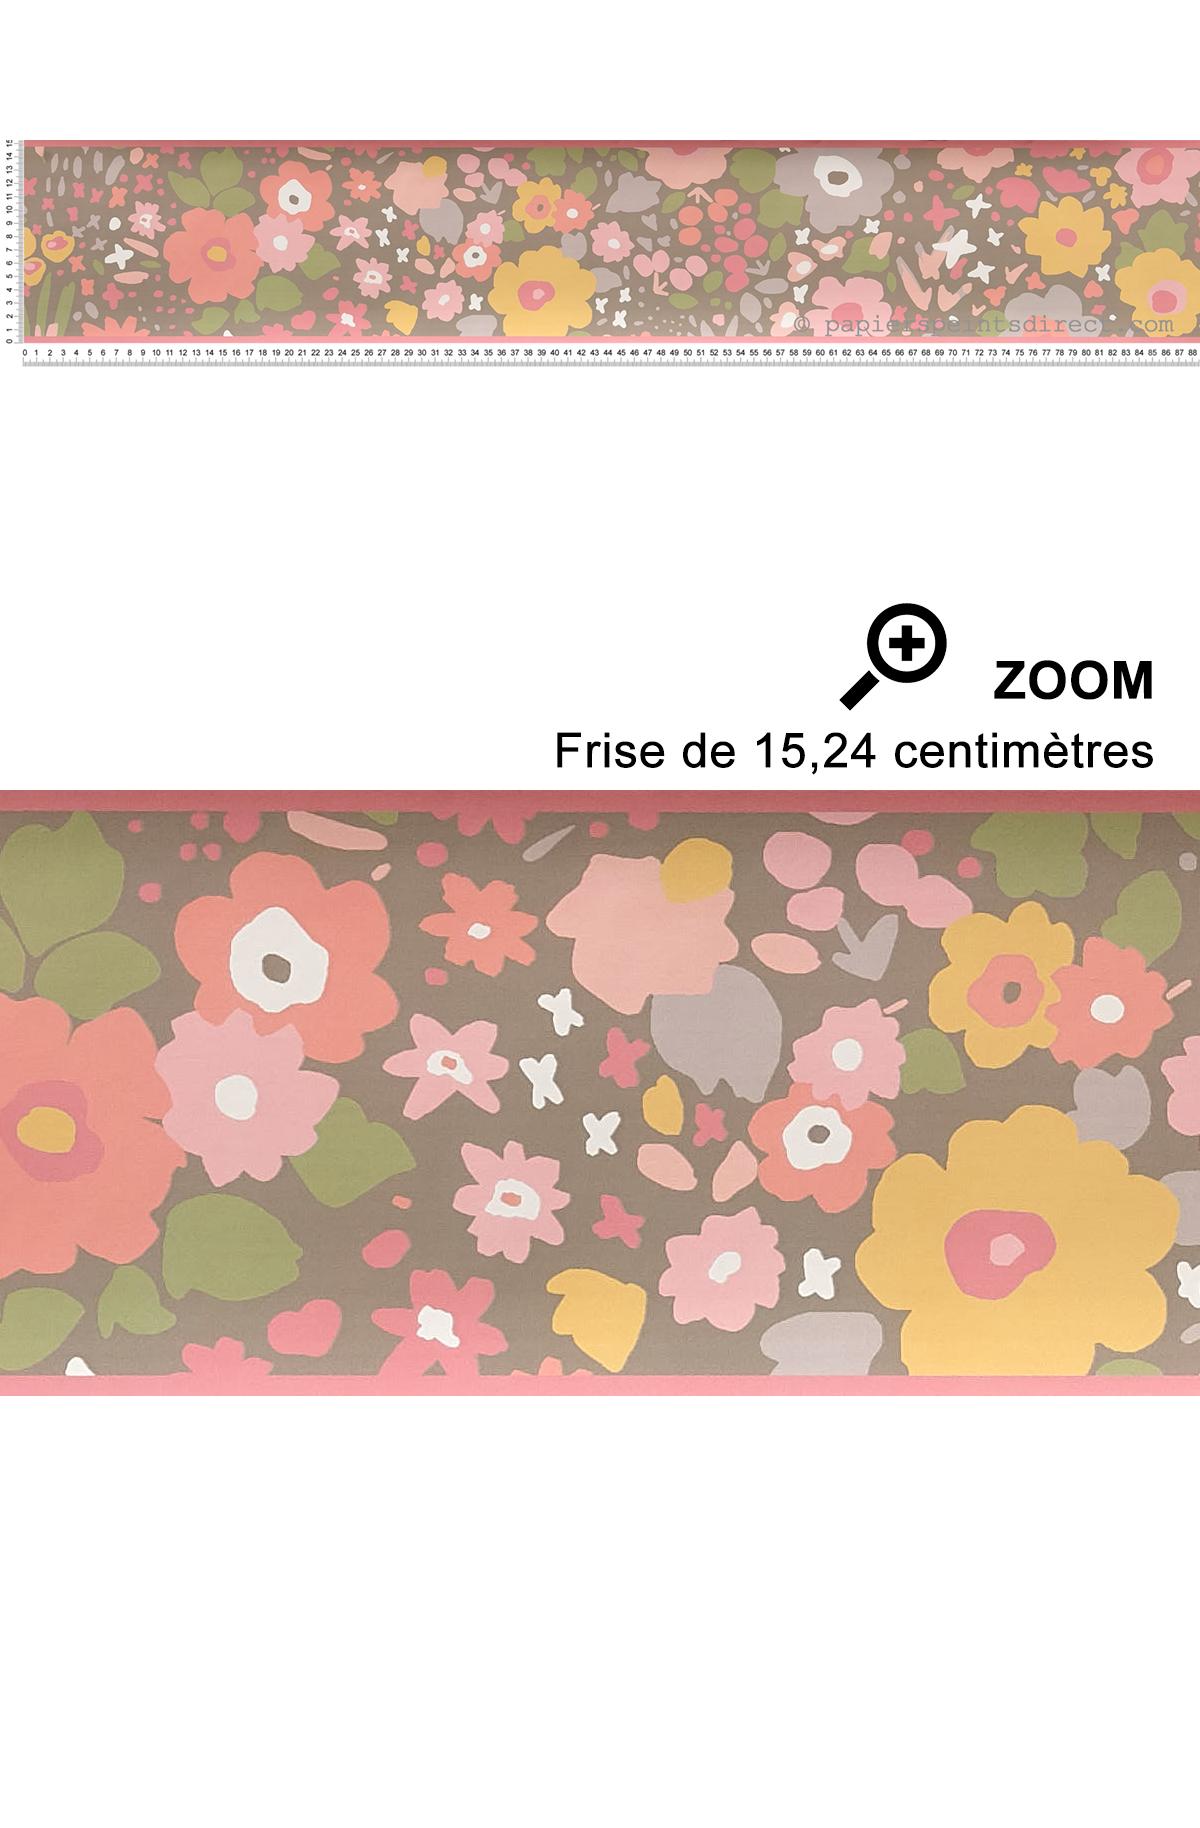 Frise fleurs rose marron - Collection Dwell Studio de York by Initiales